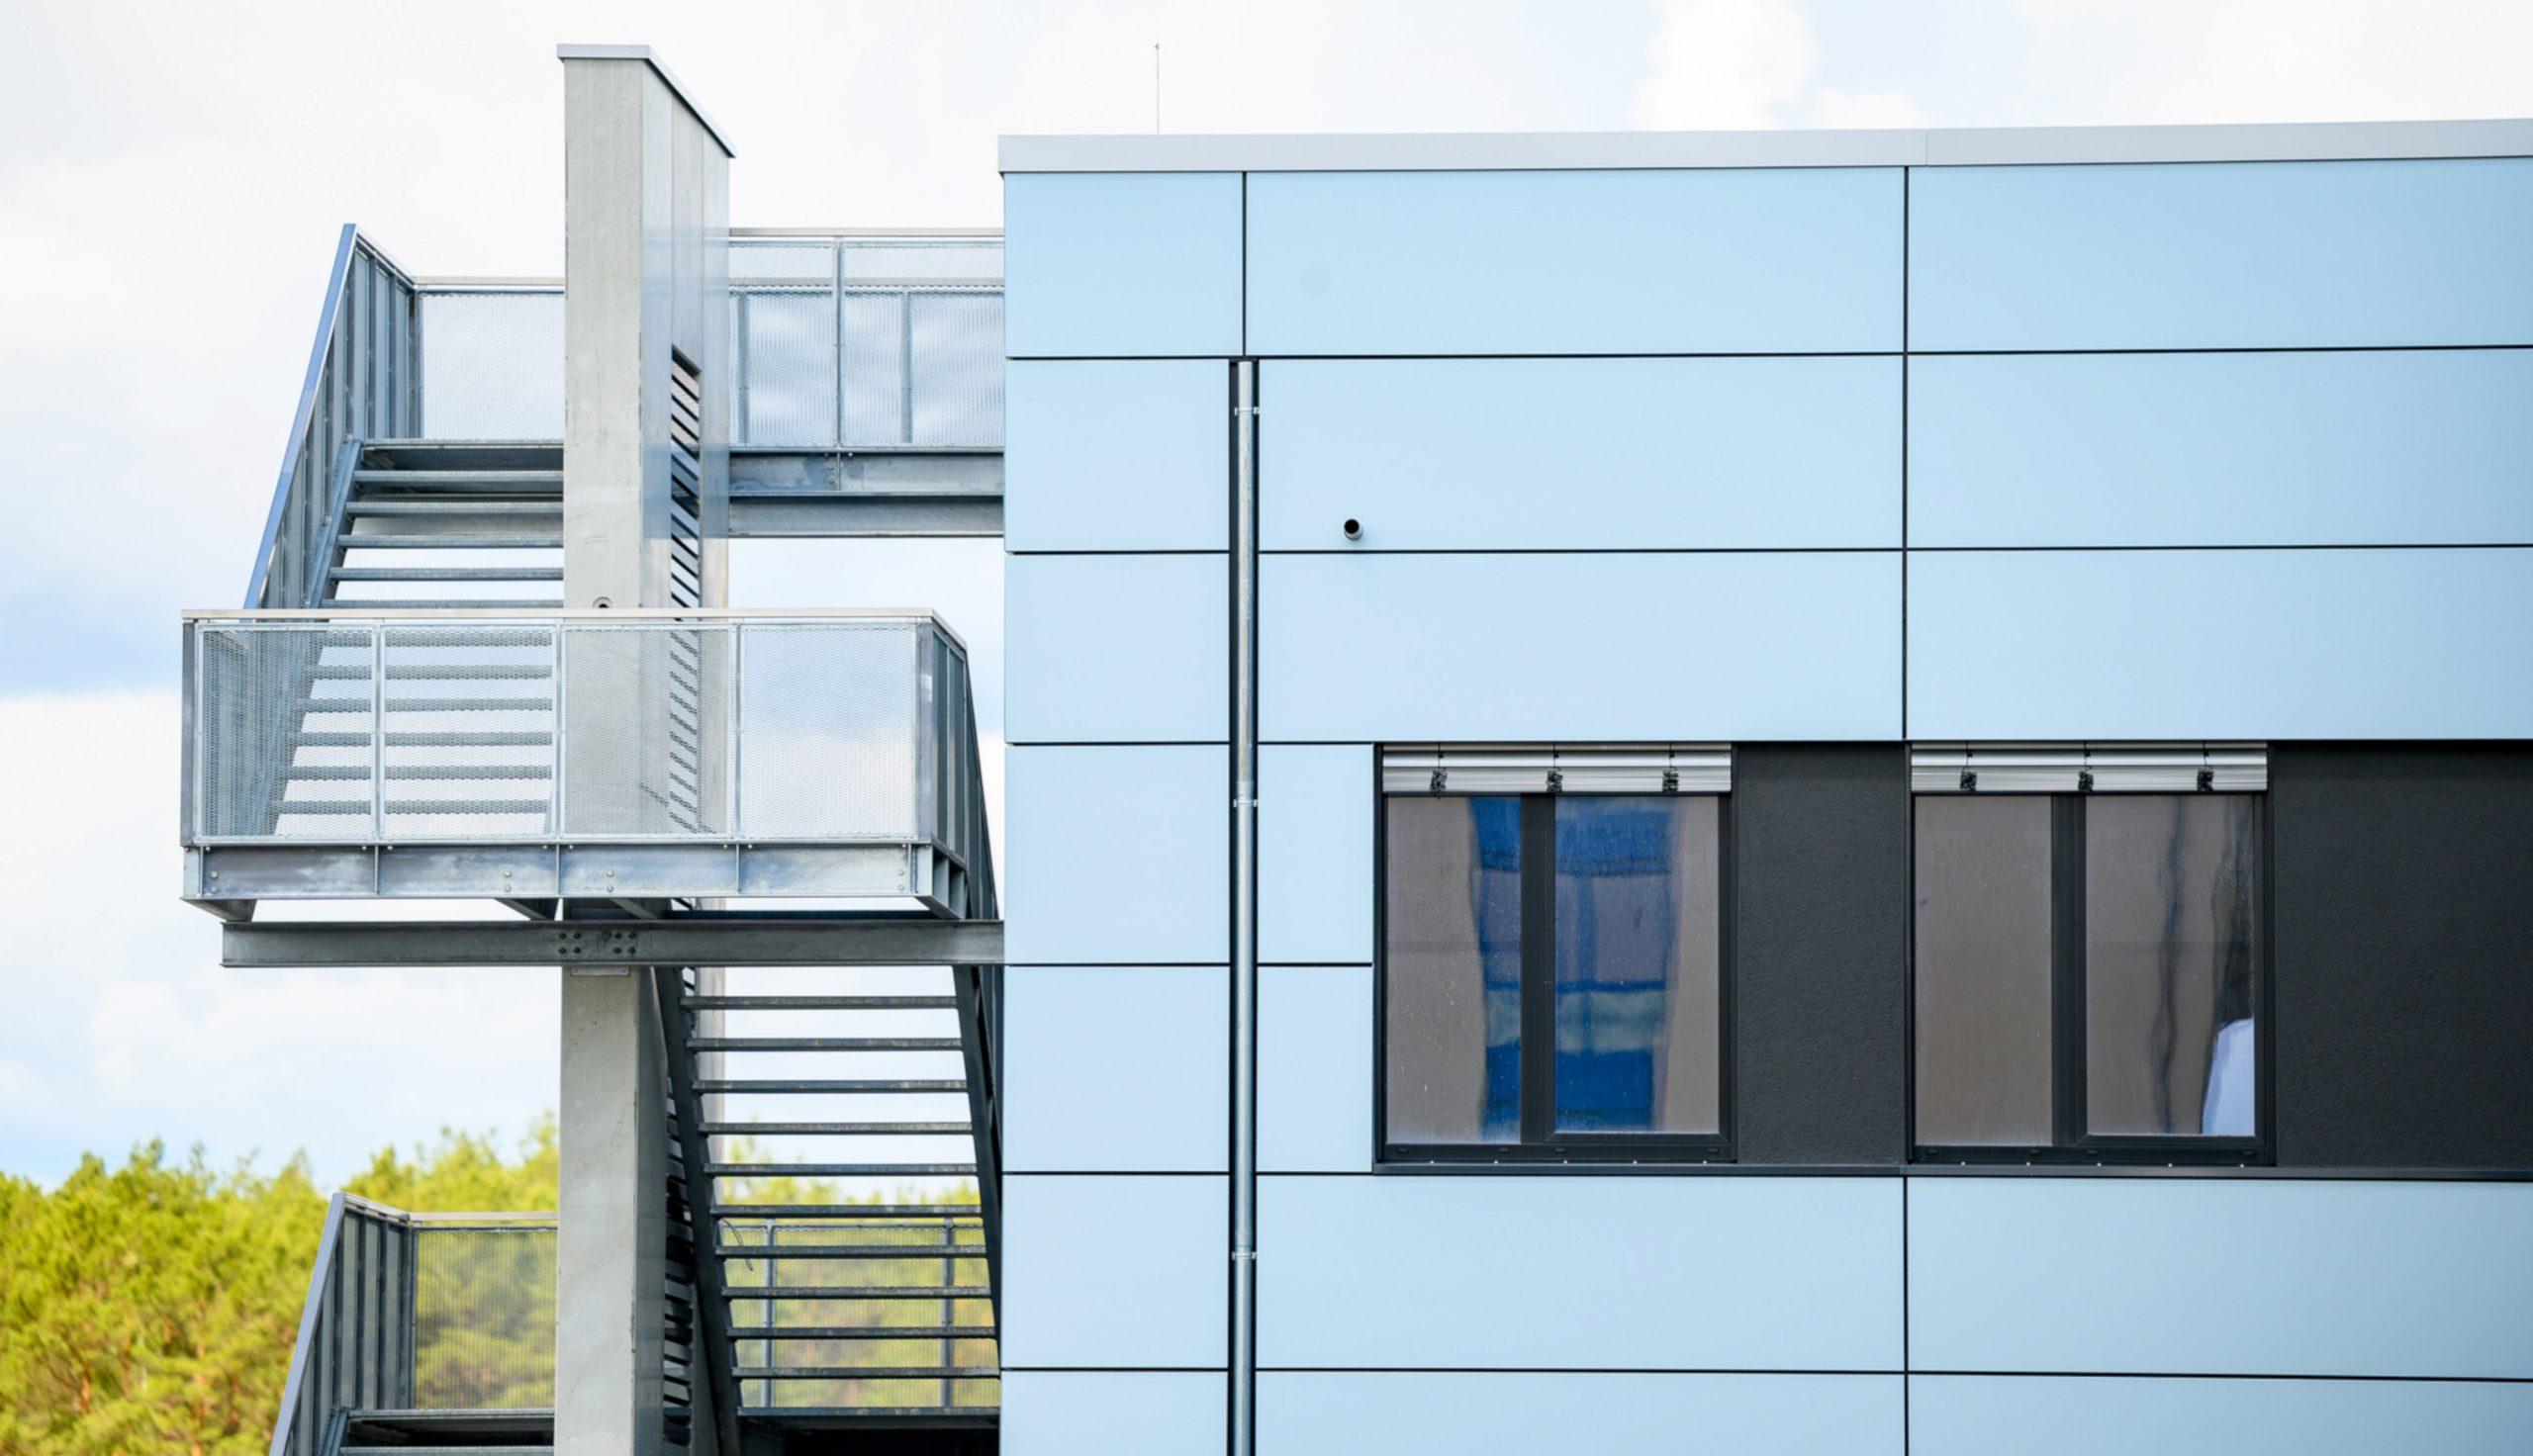 Projektbild 7, Kfz Instandsetzungshalle |  |  H.-J. Zieten Kaserne Beelitz